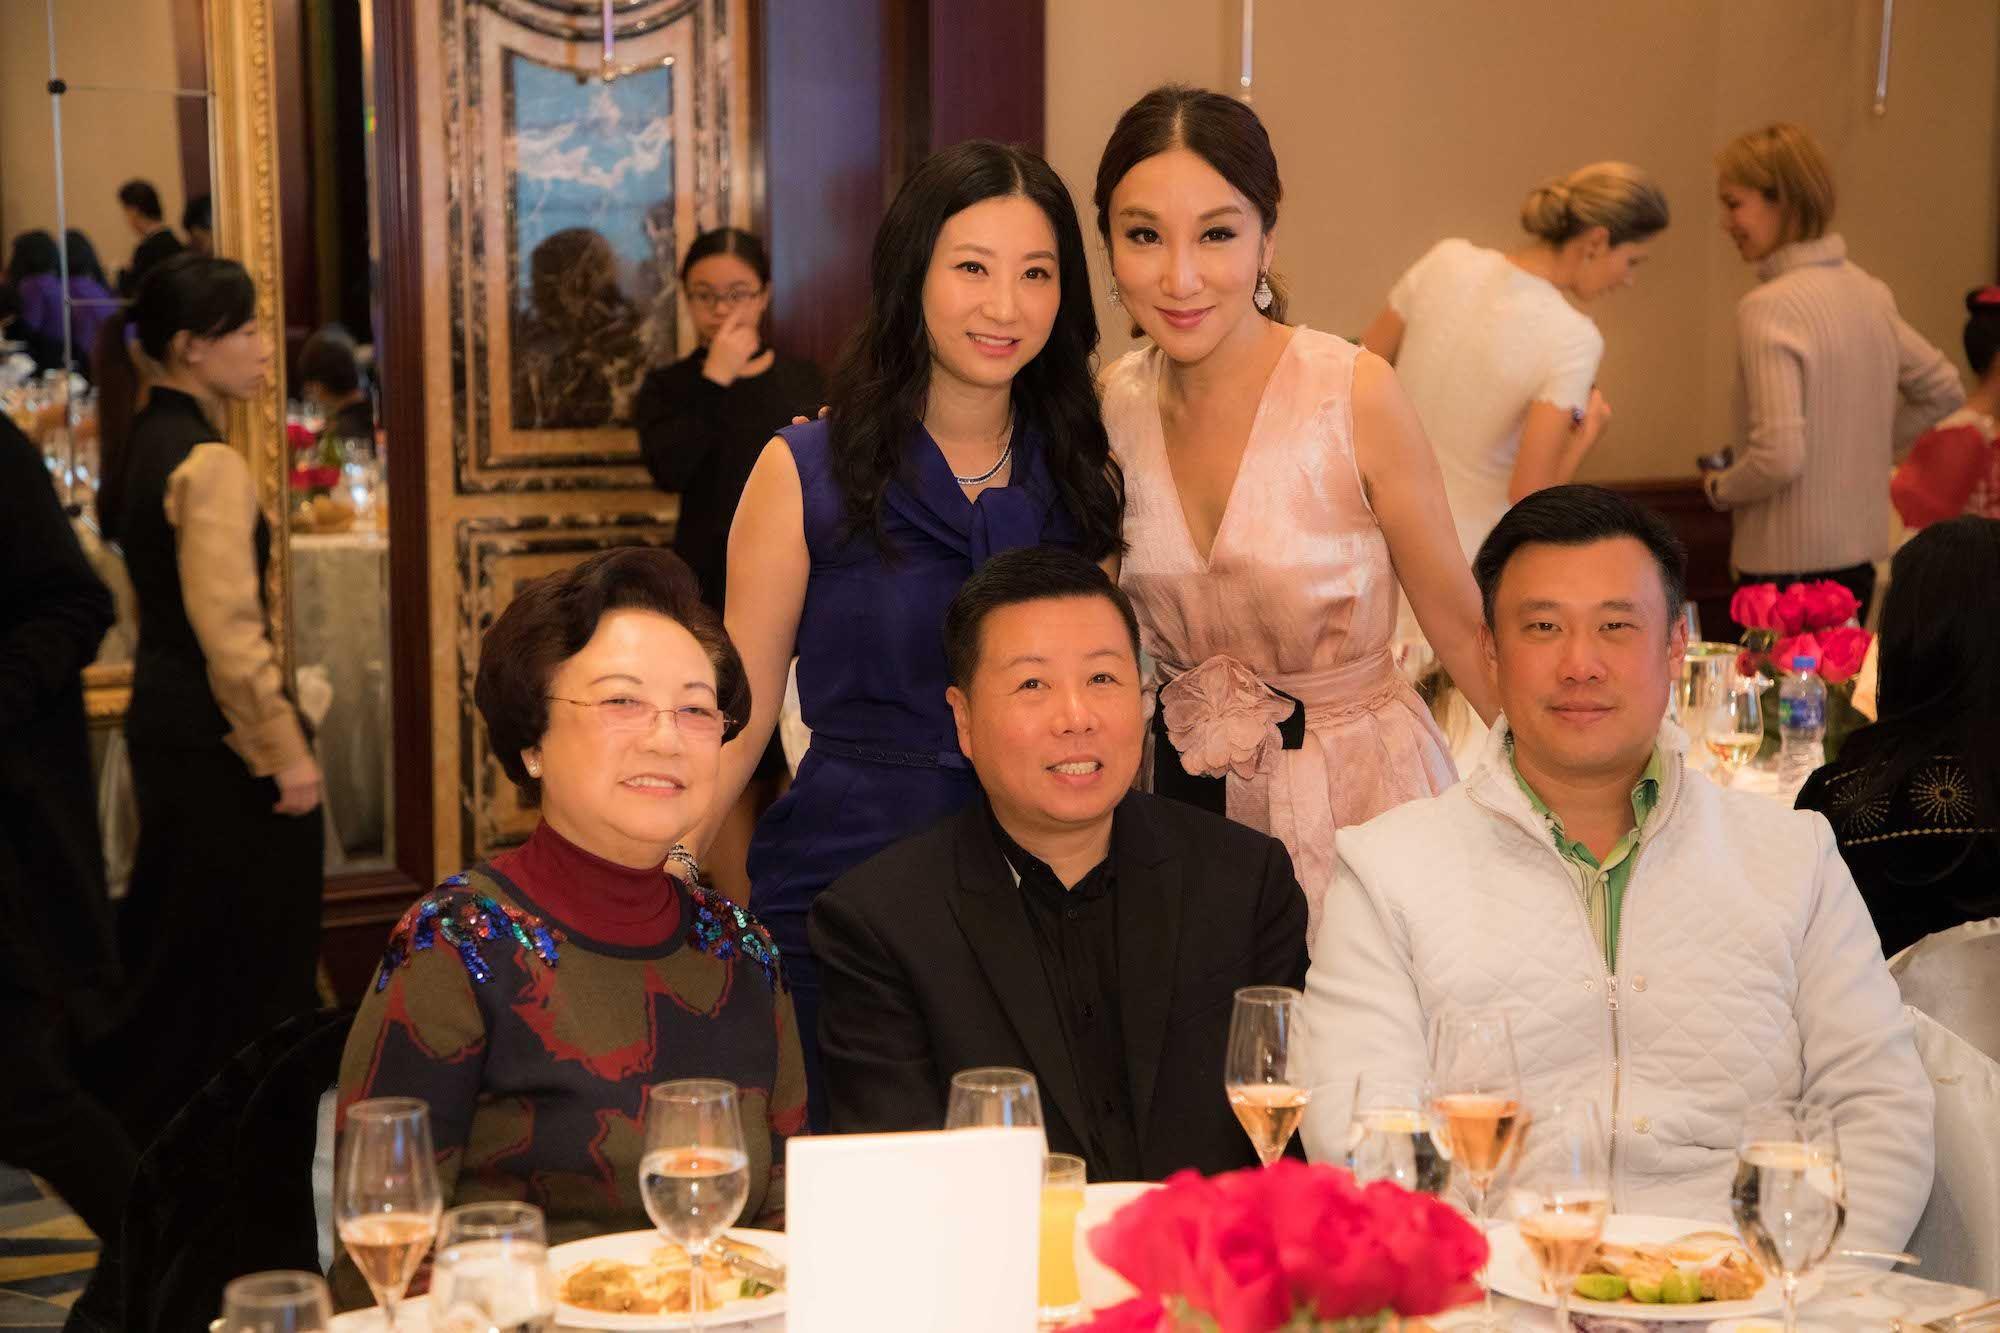 Standing - Lillian Lee-Fong, Jane Louey. Seated - Kathryn Louey, James Louey, Ryan Fong